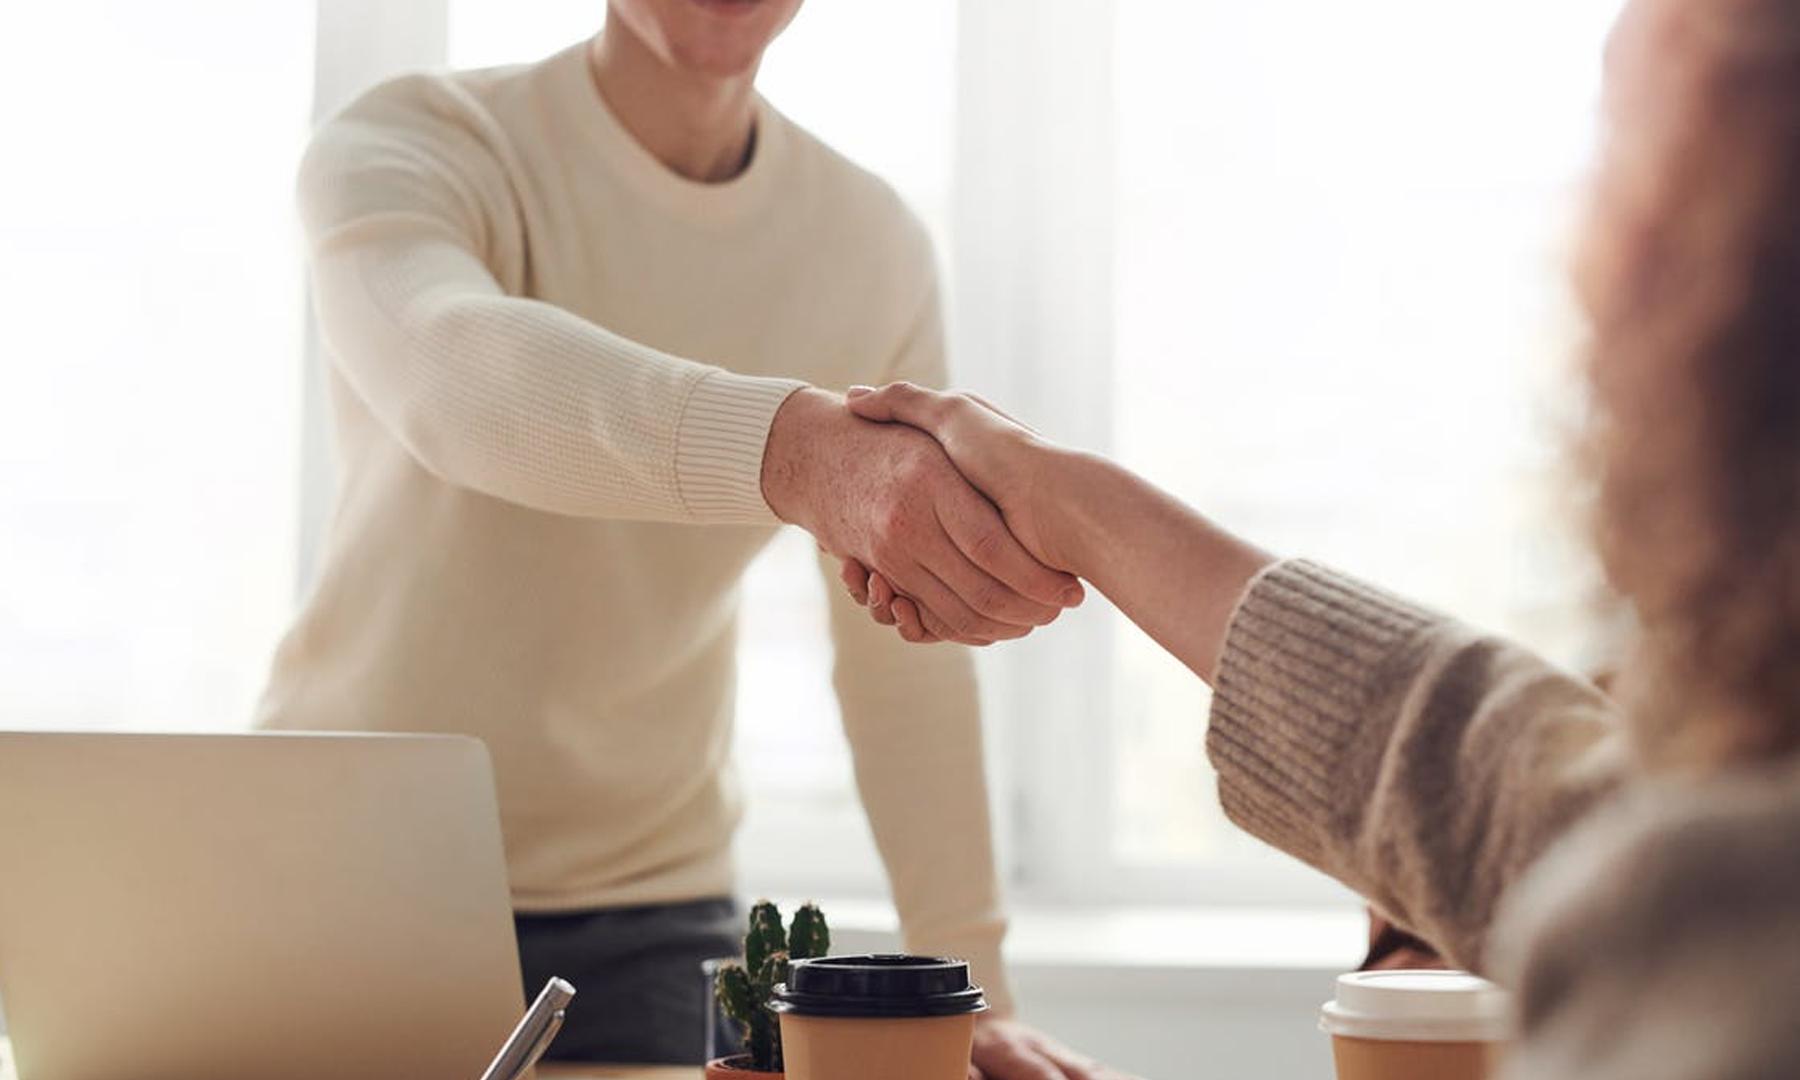 Ztel joins Partner Wholesale Networks